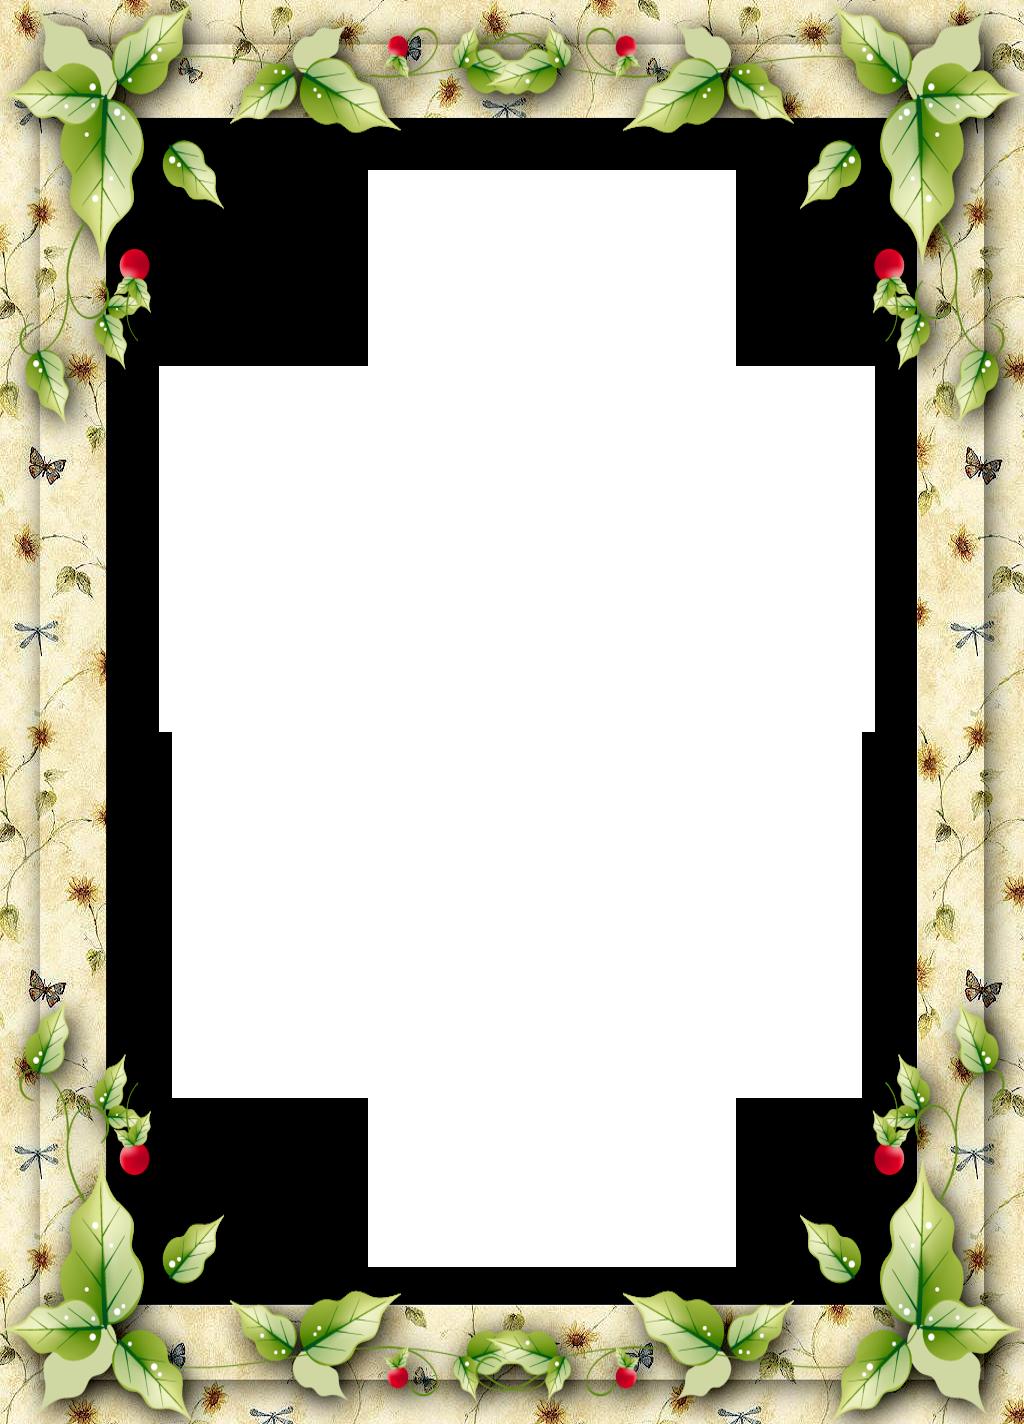 Clipart borders religious. Christmas frame with mistletoe